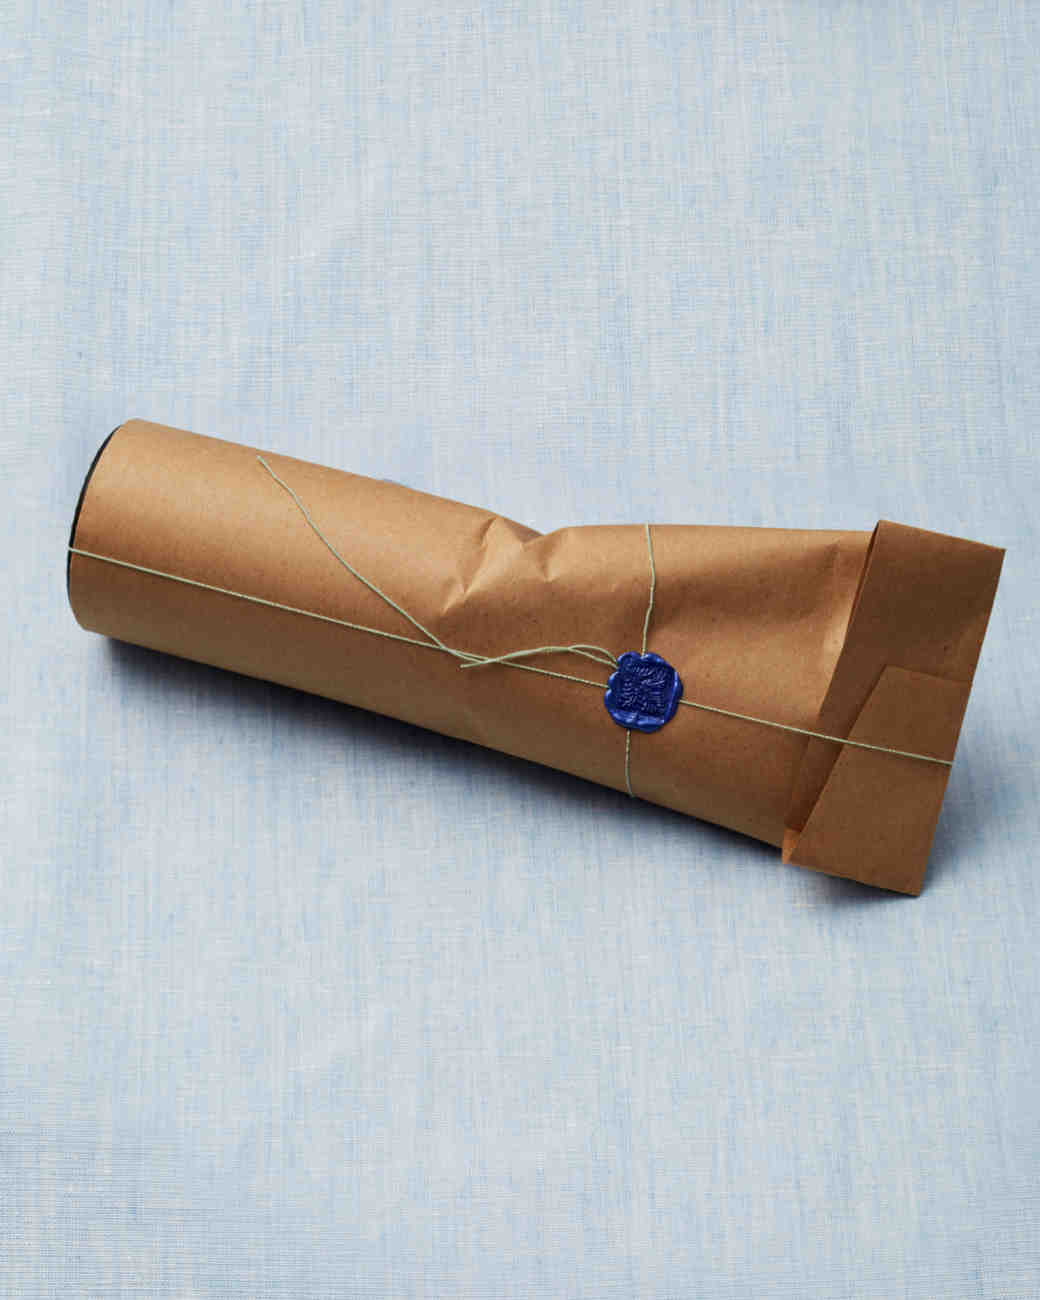 az-diy-packaging-seal-127-d111933-0615.jpg